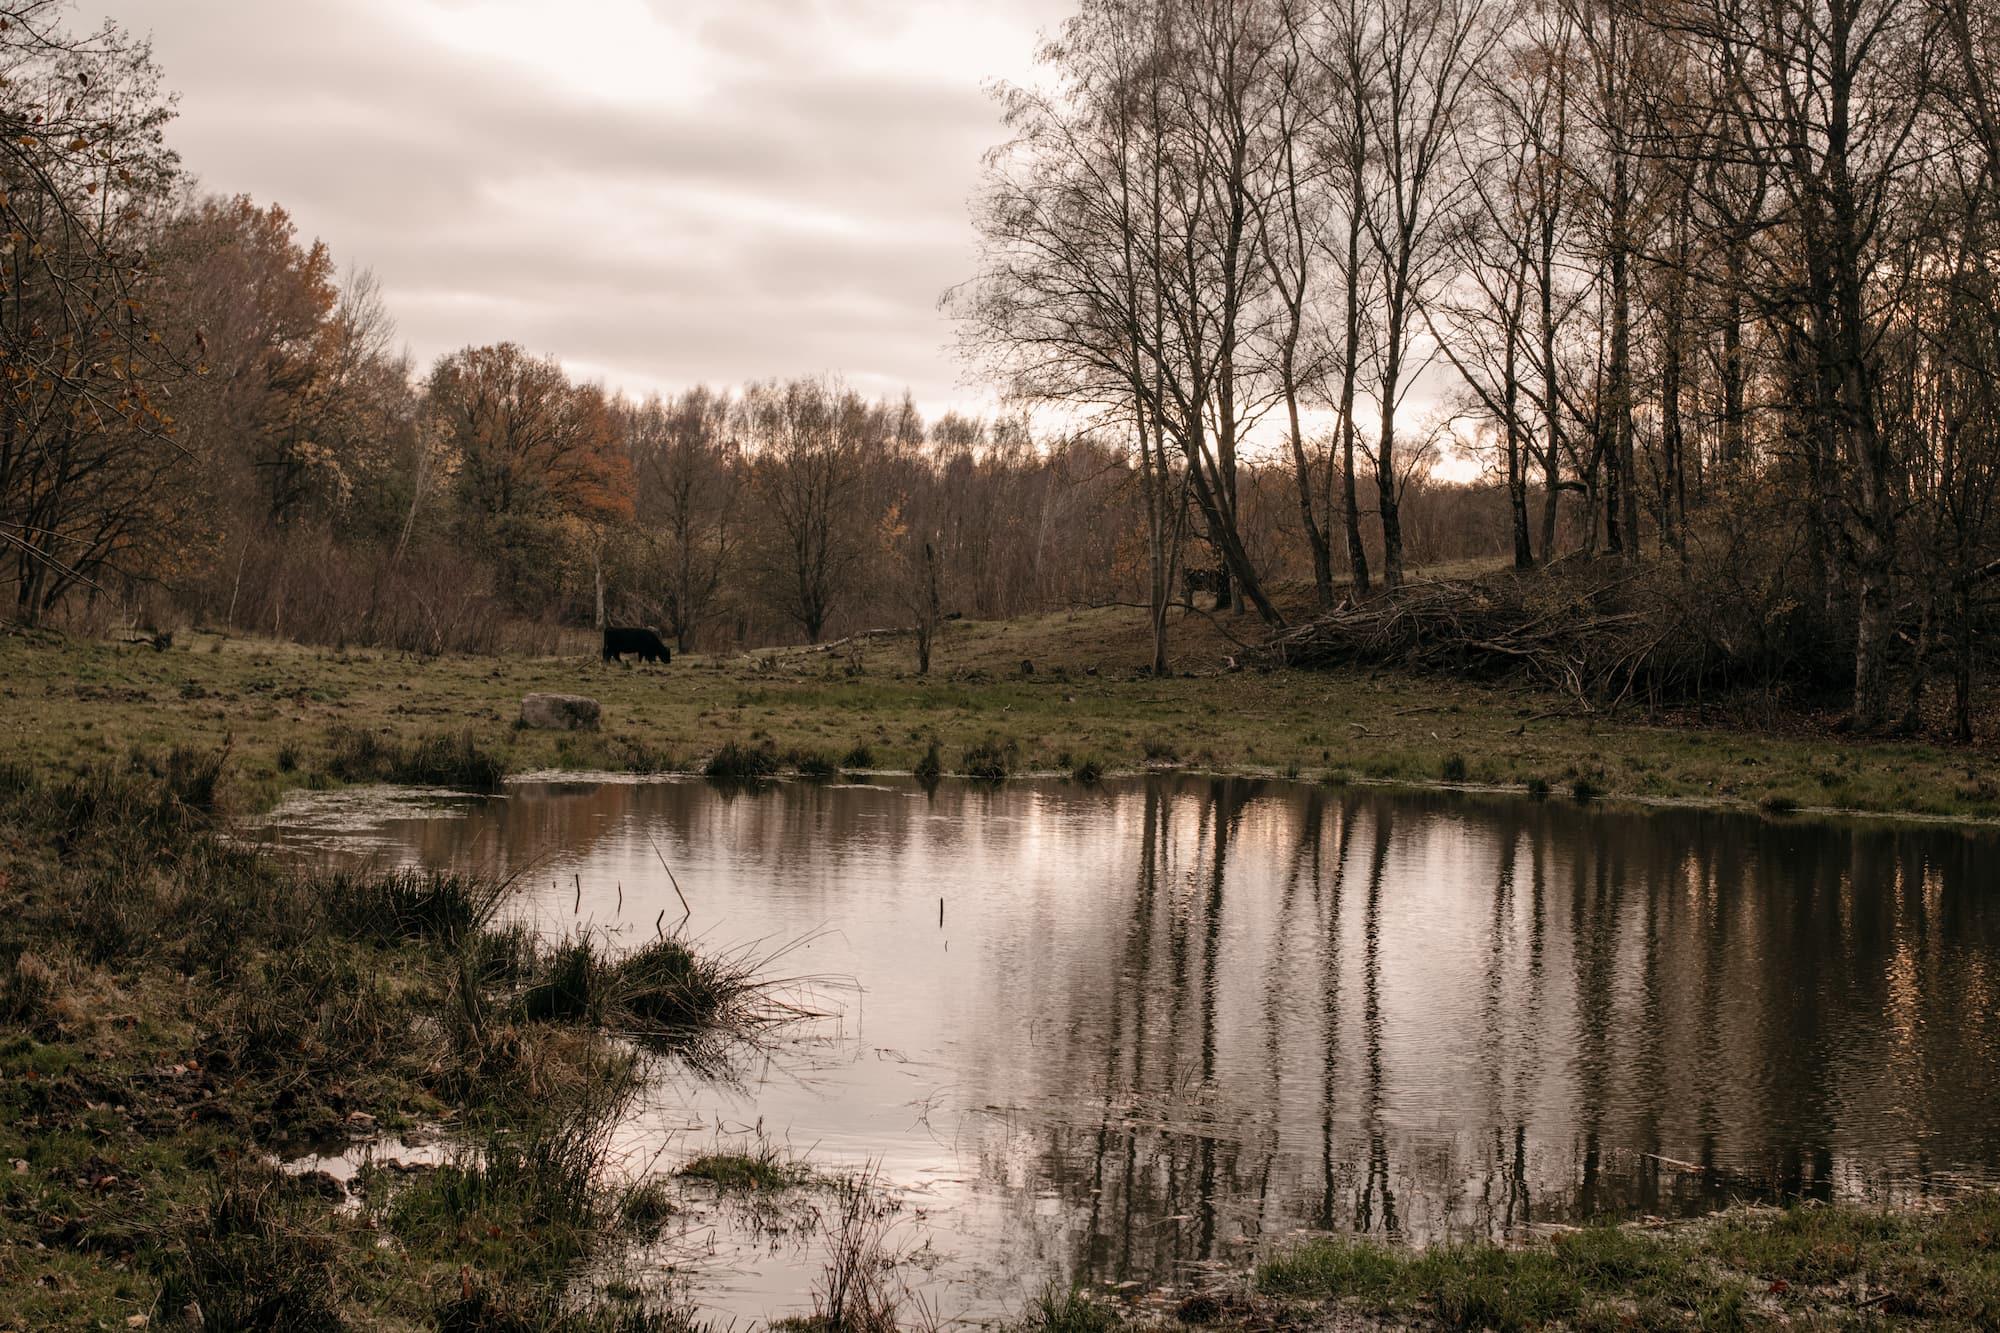 naturschutzgebiet hamburg